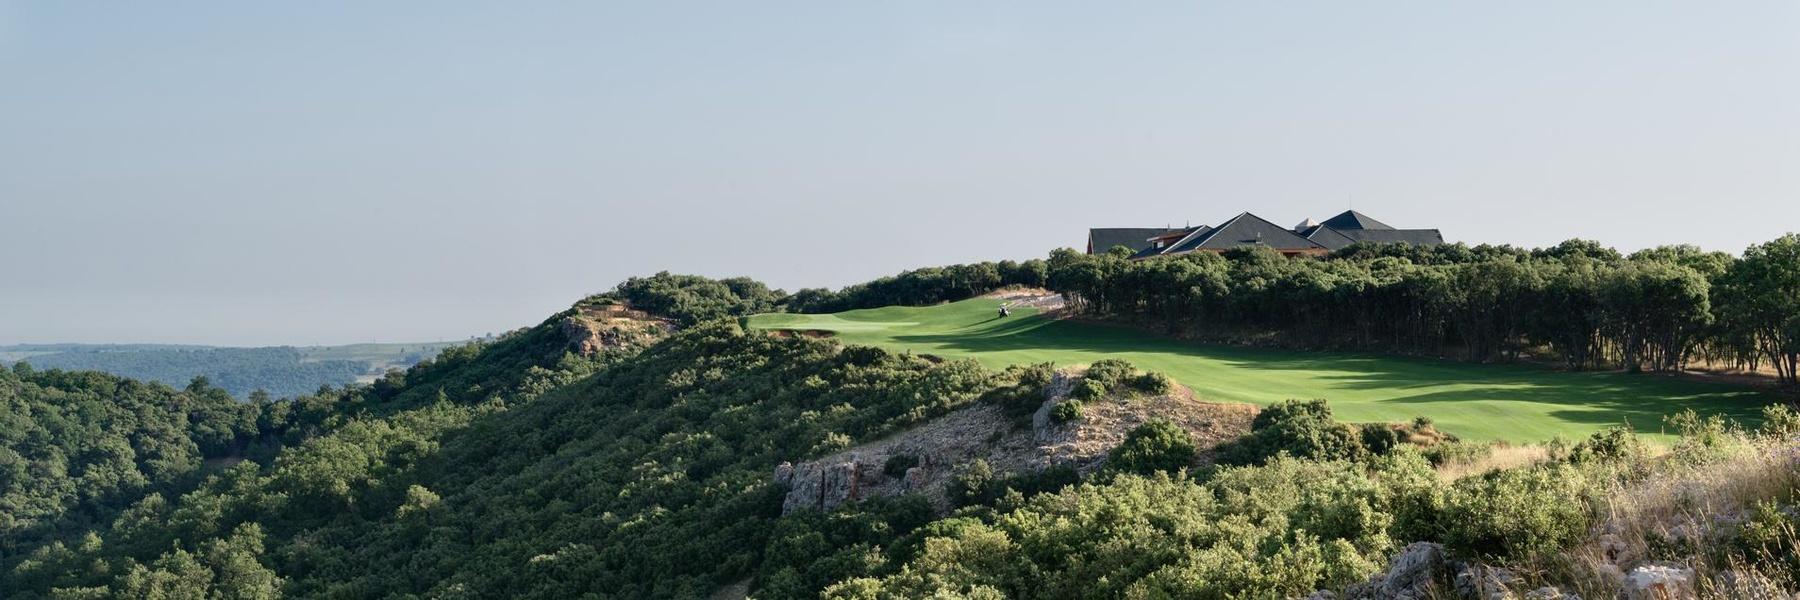 Michlifen-Golf-and-Country-Clubcrop_ALK0688C